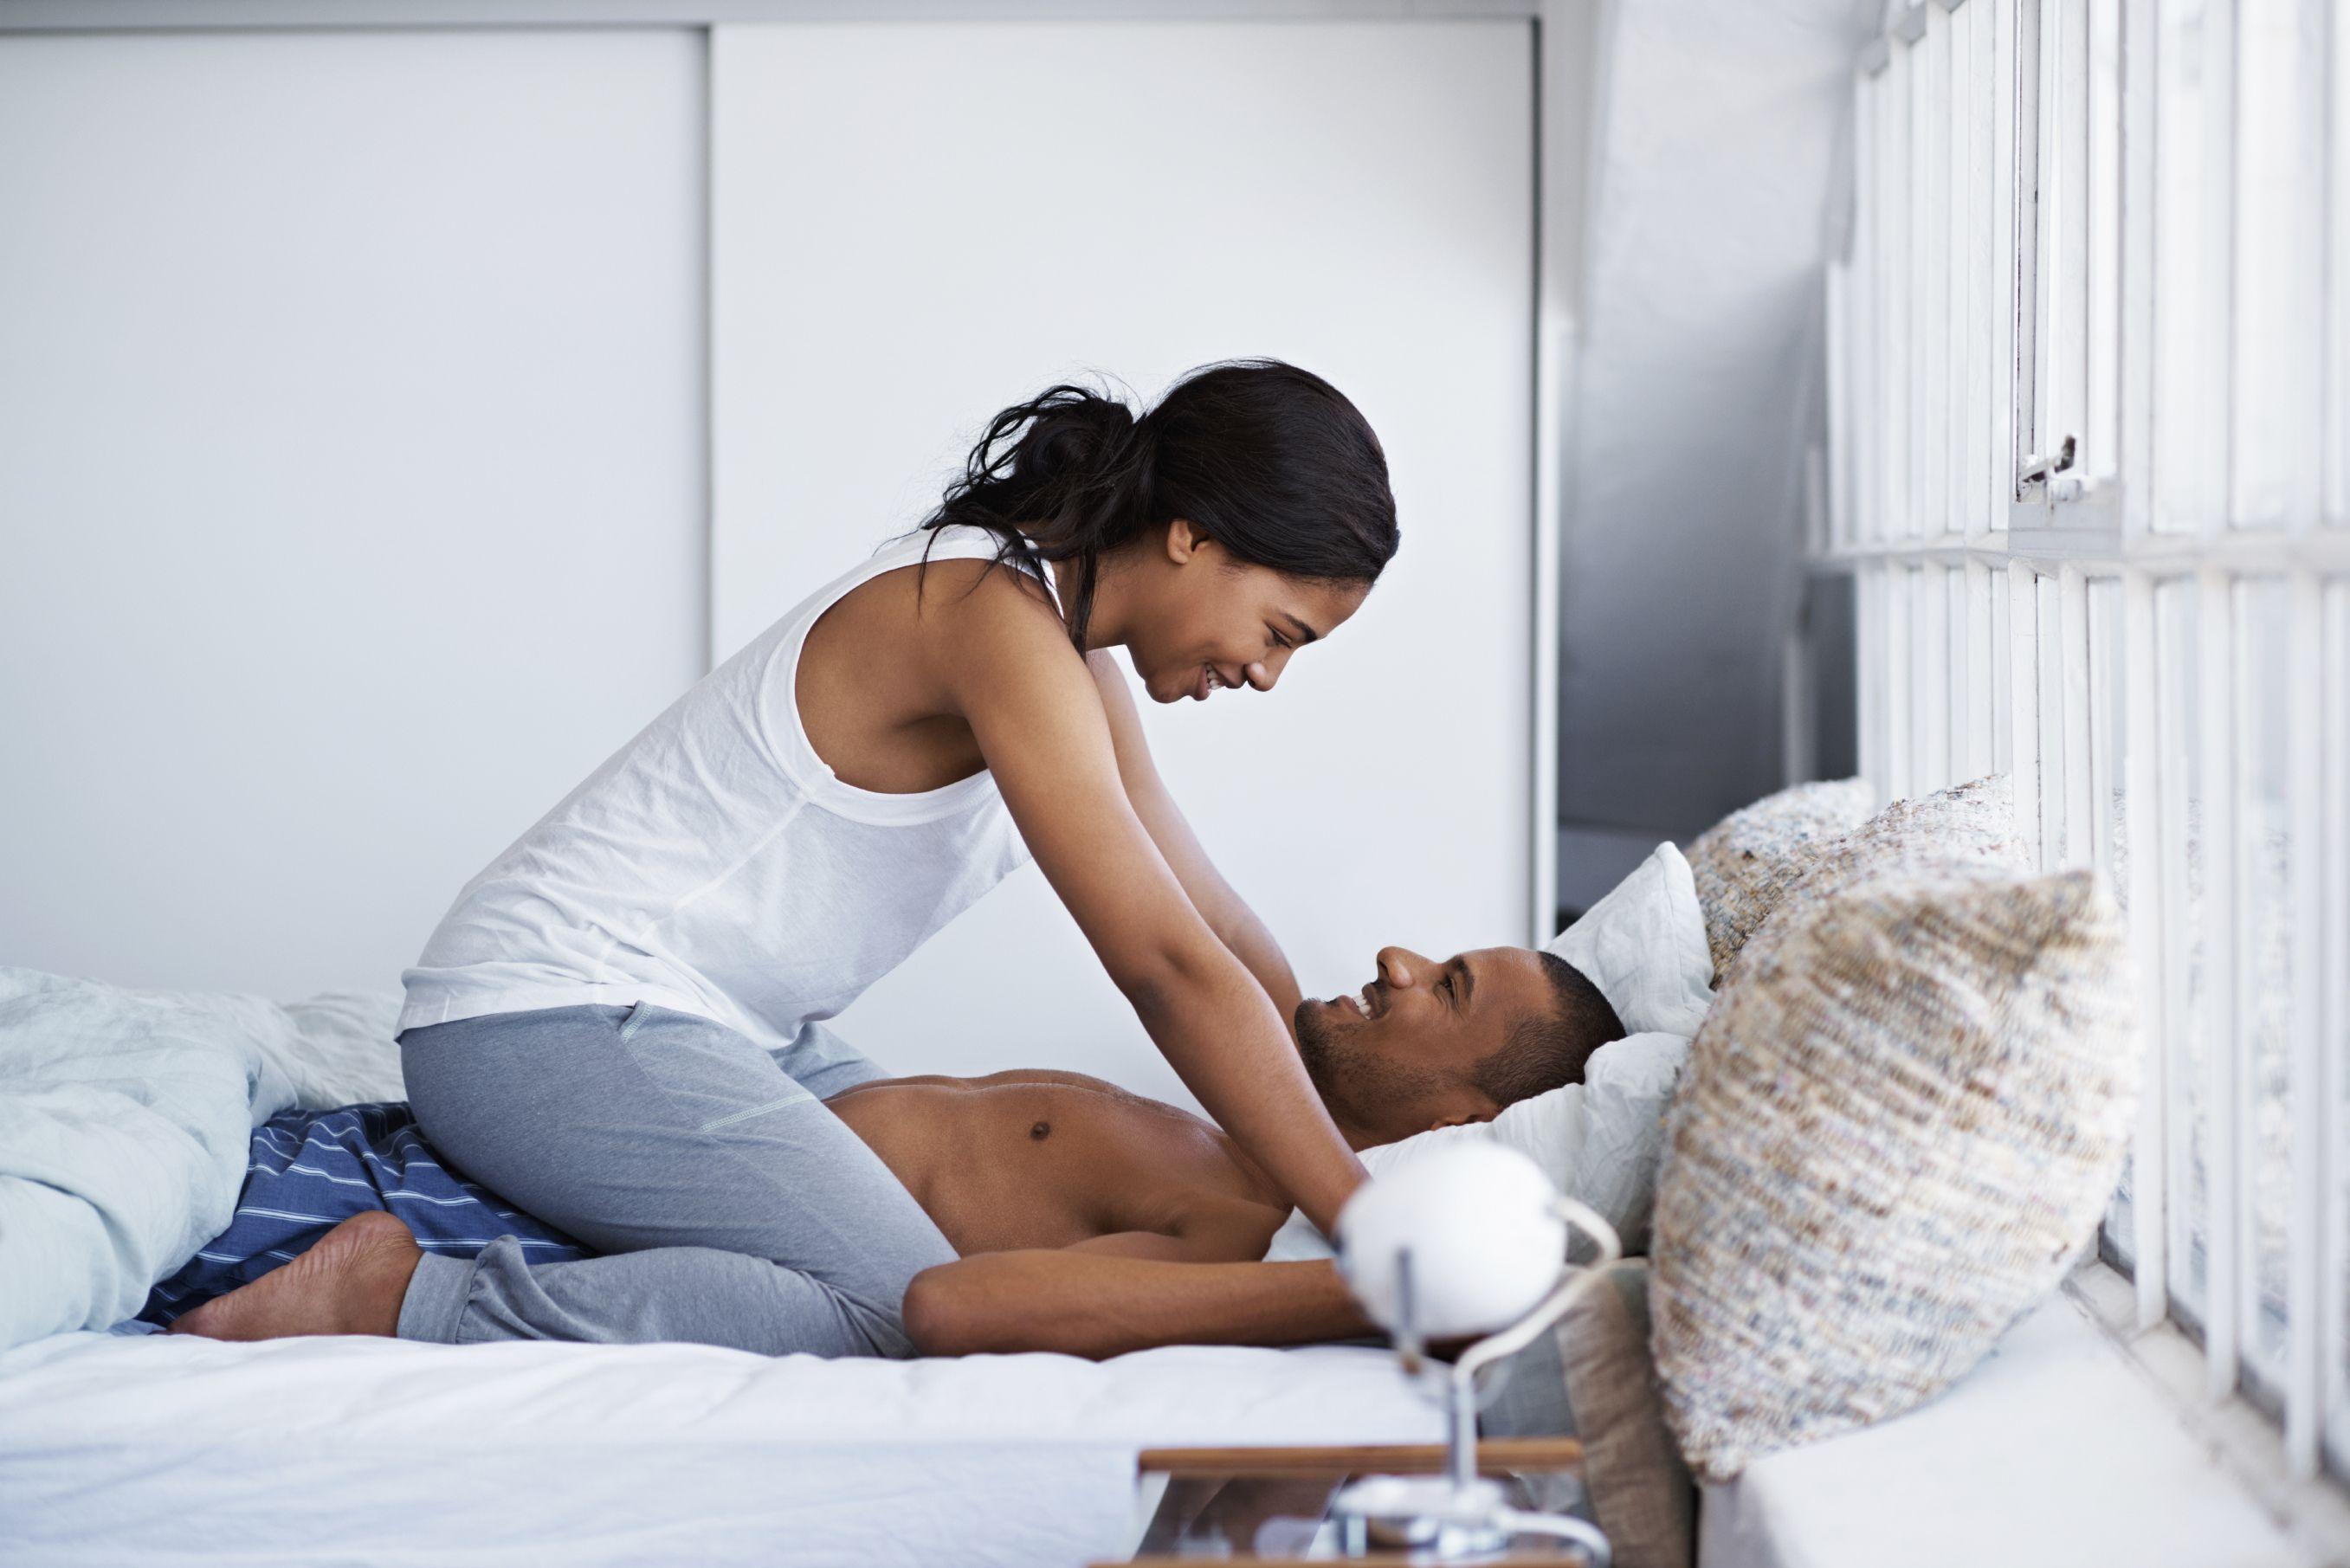 Having man menstrual period sex their woman